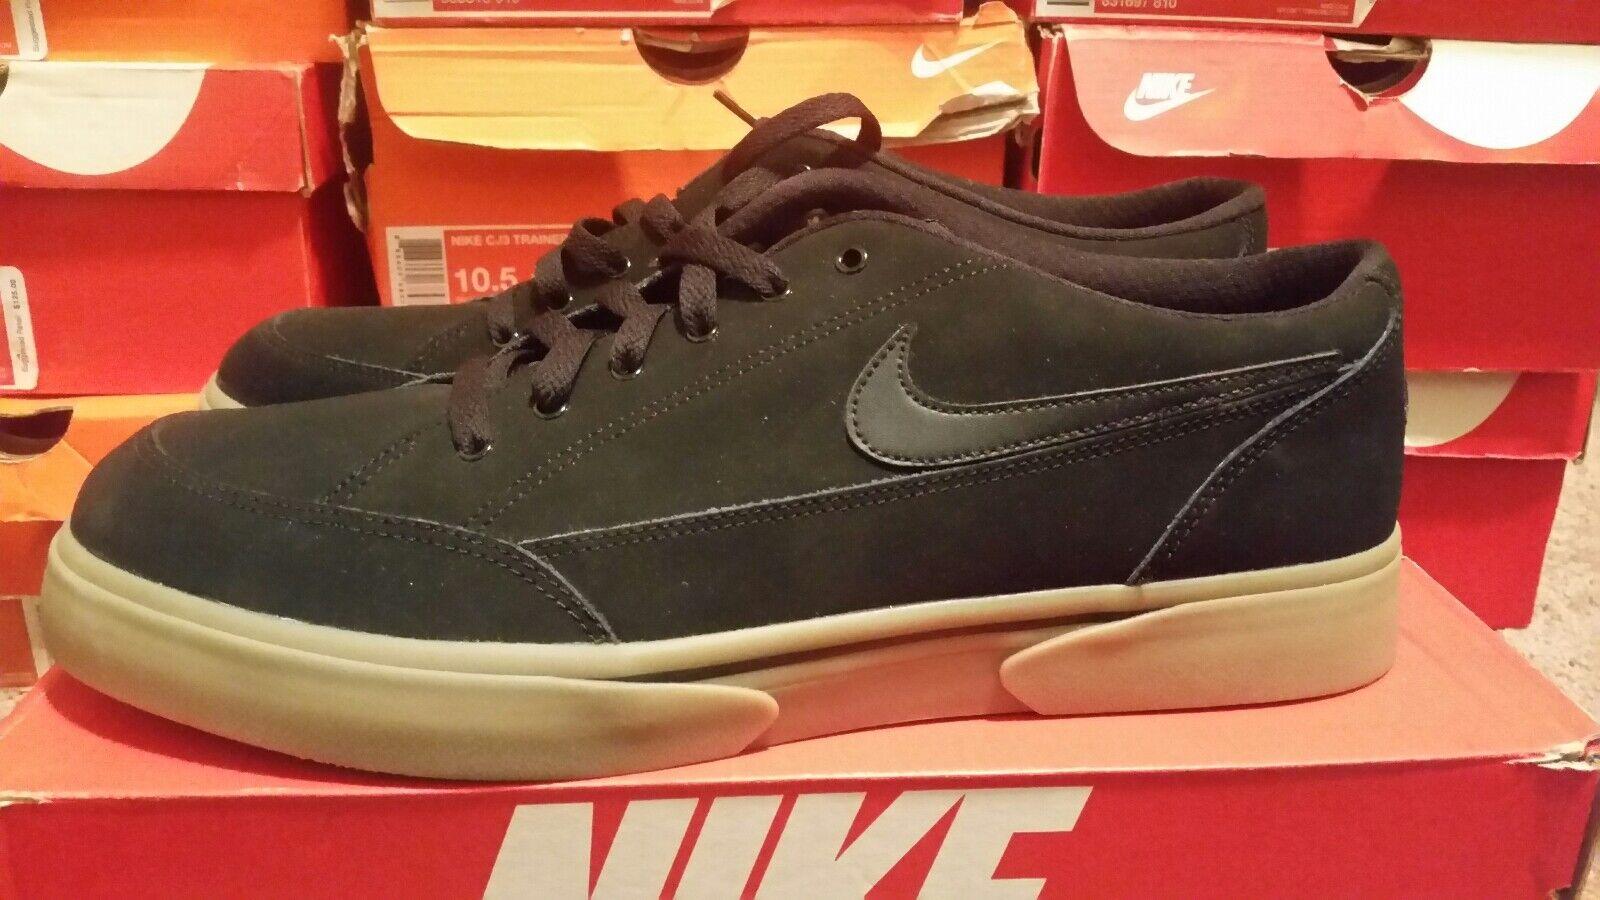 Nike gts 16 nabuk uomini scarpe da tennis 844809-003 46